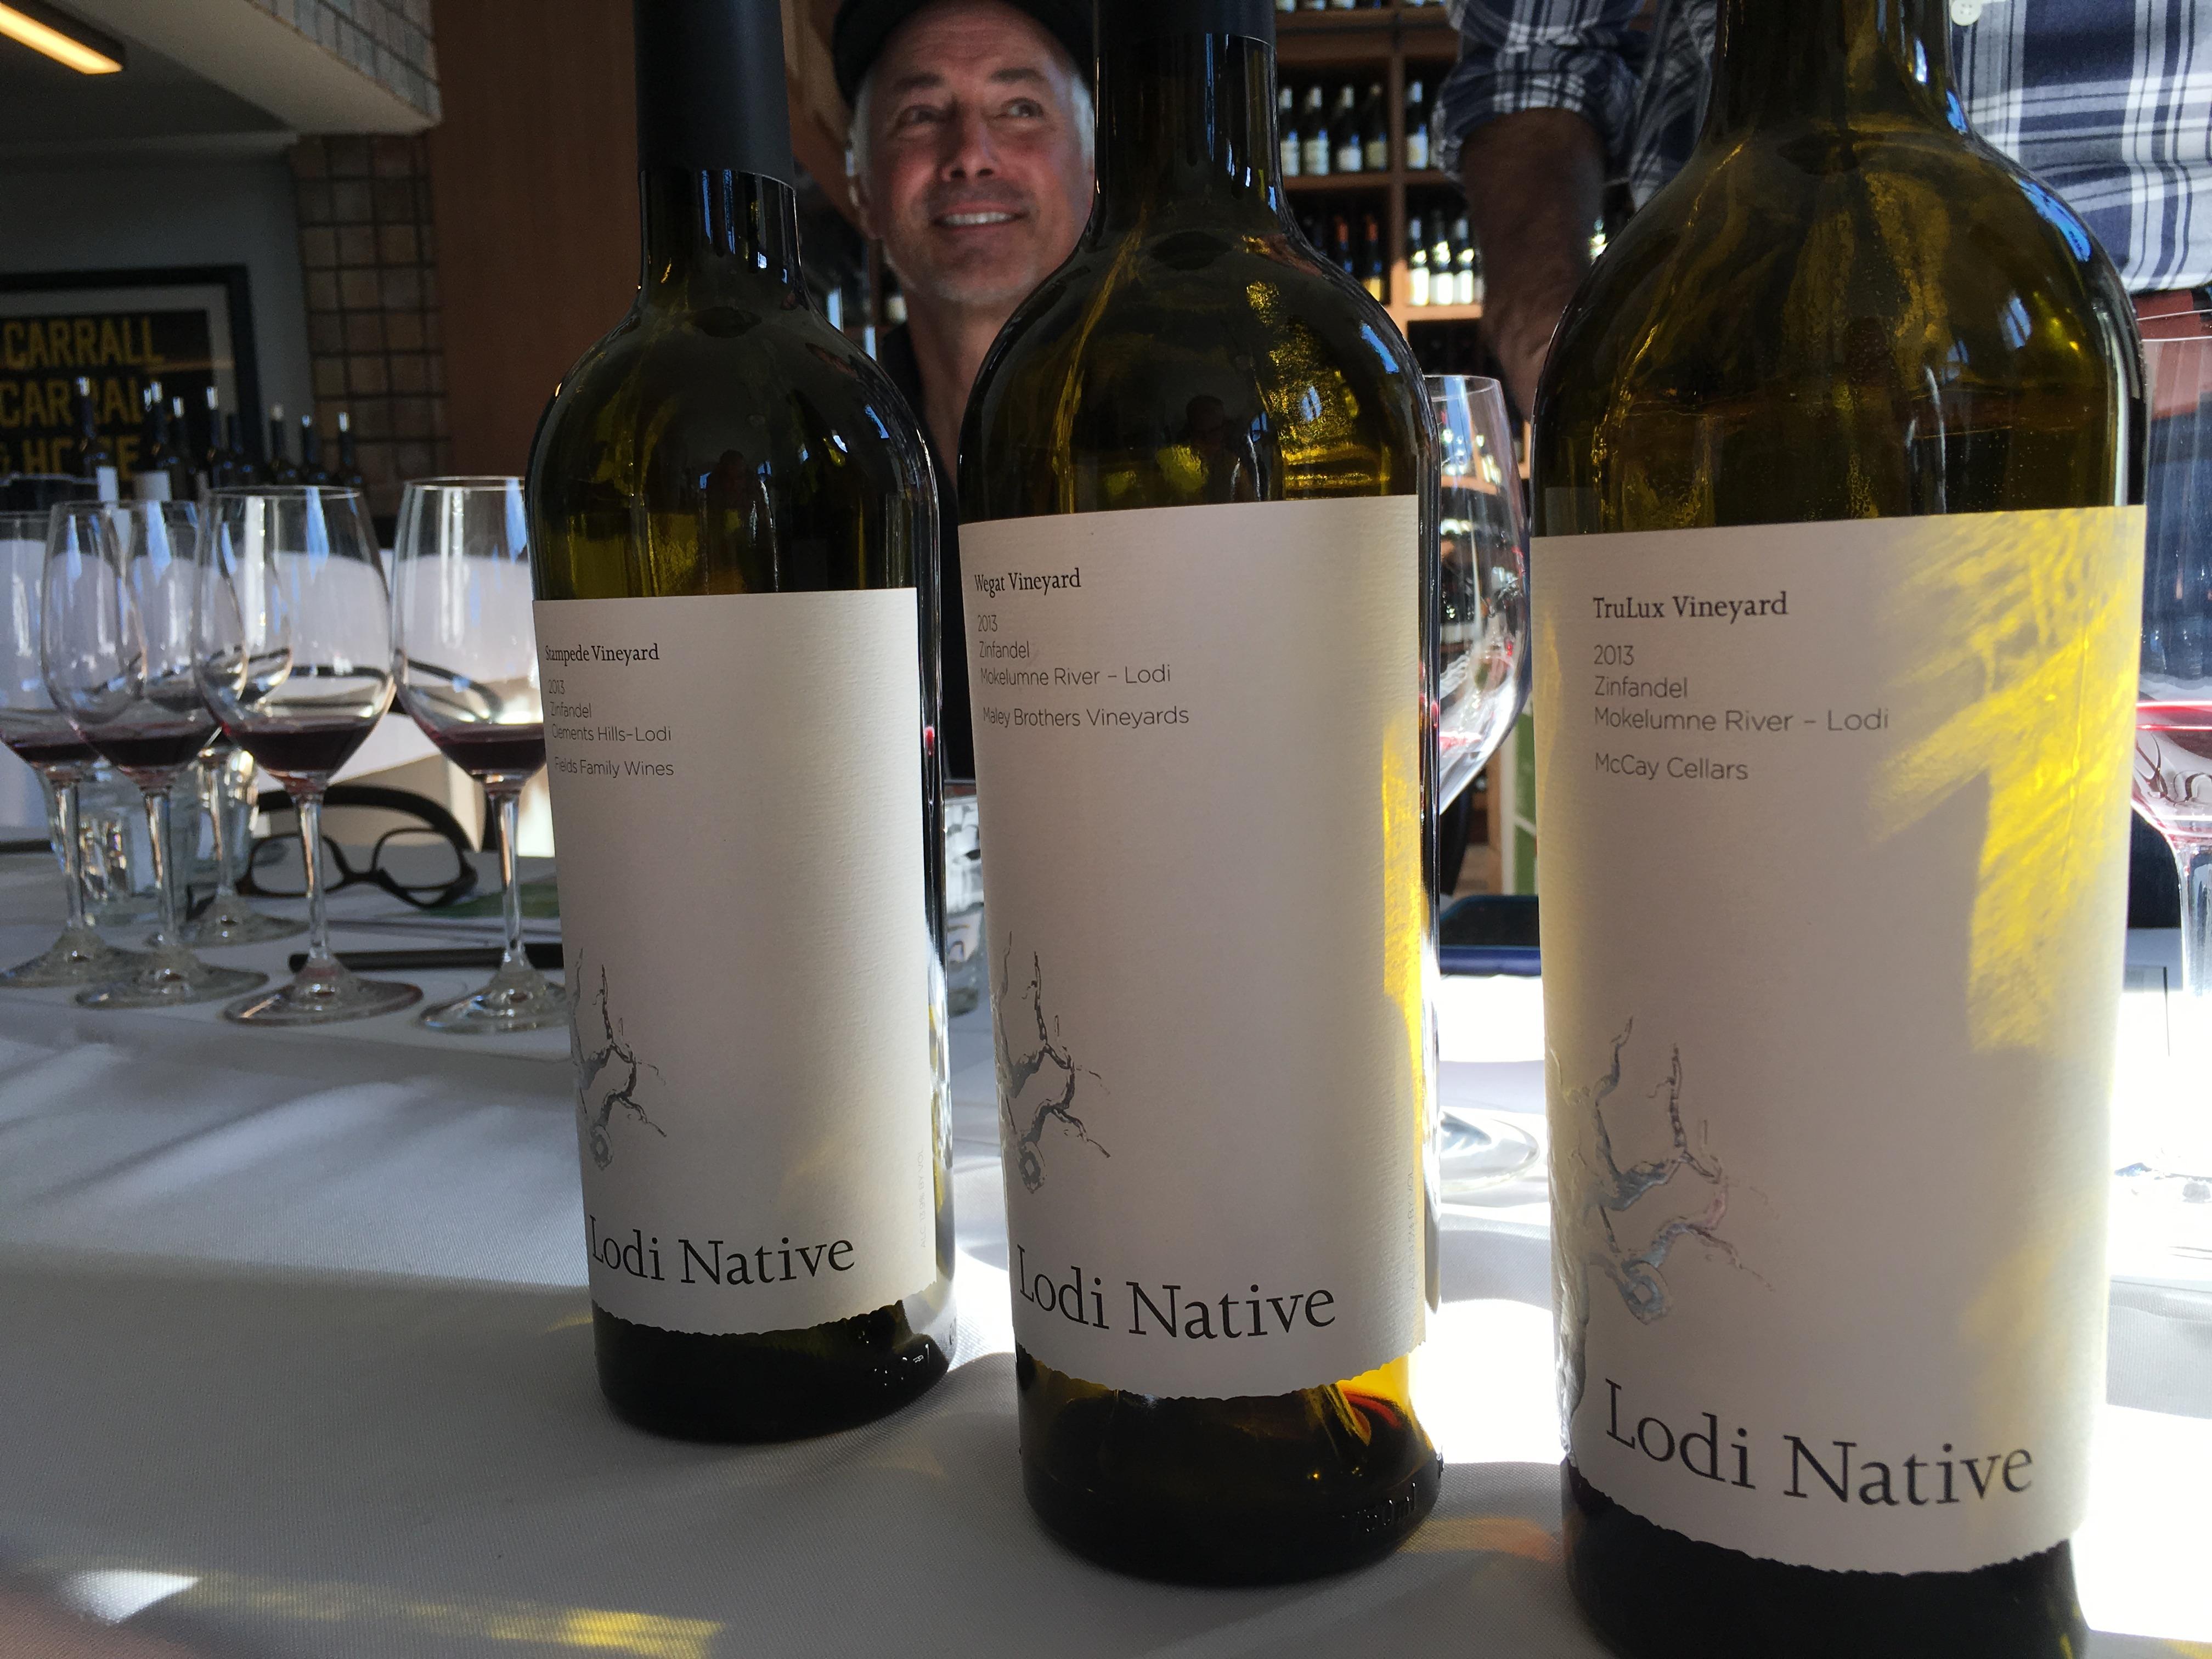 2013 Lodi Native Stampede Vineyard Fields Family Wines